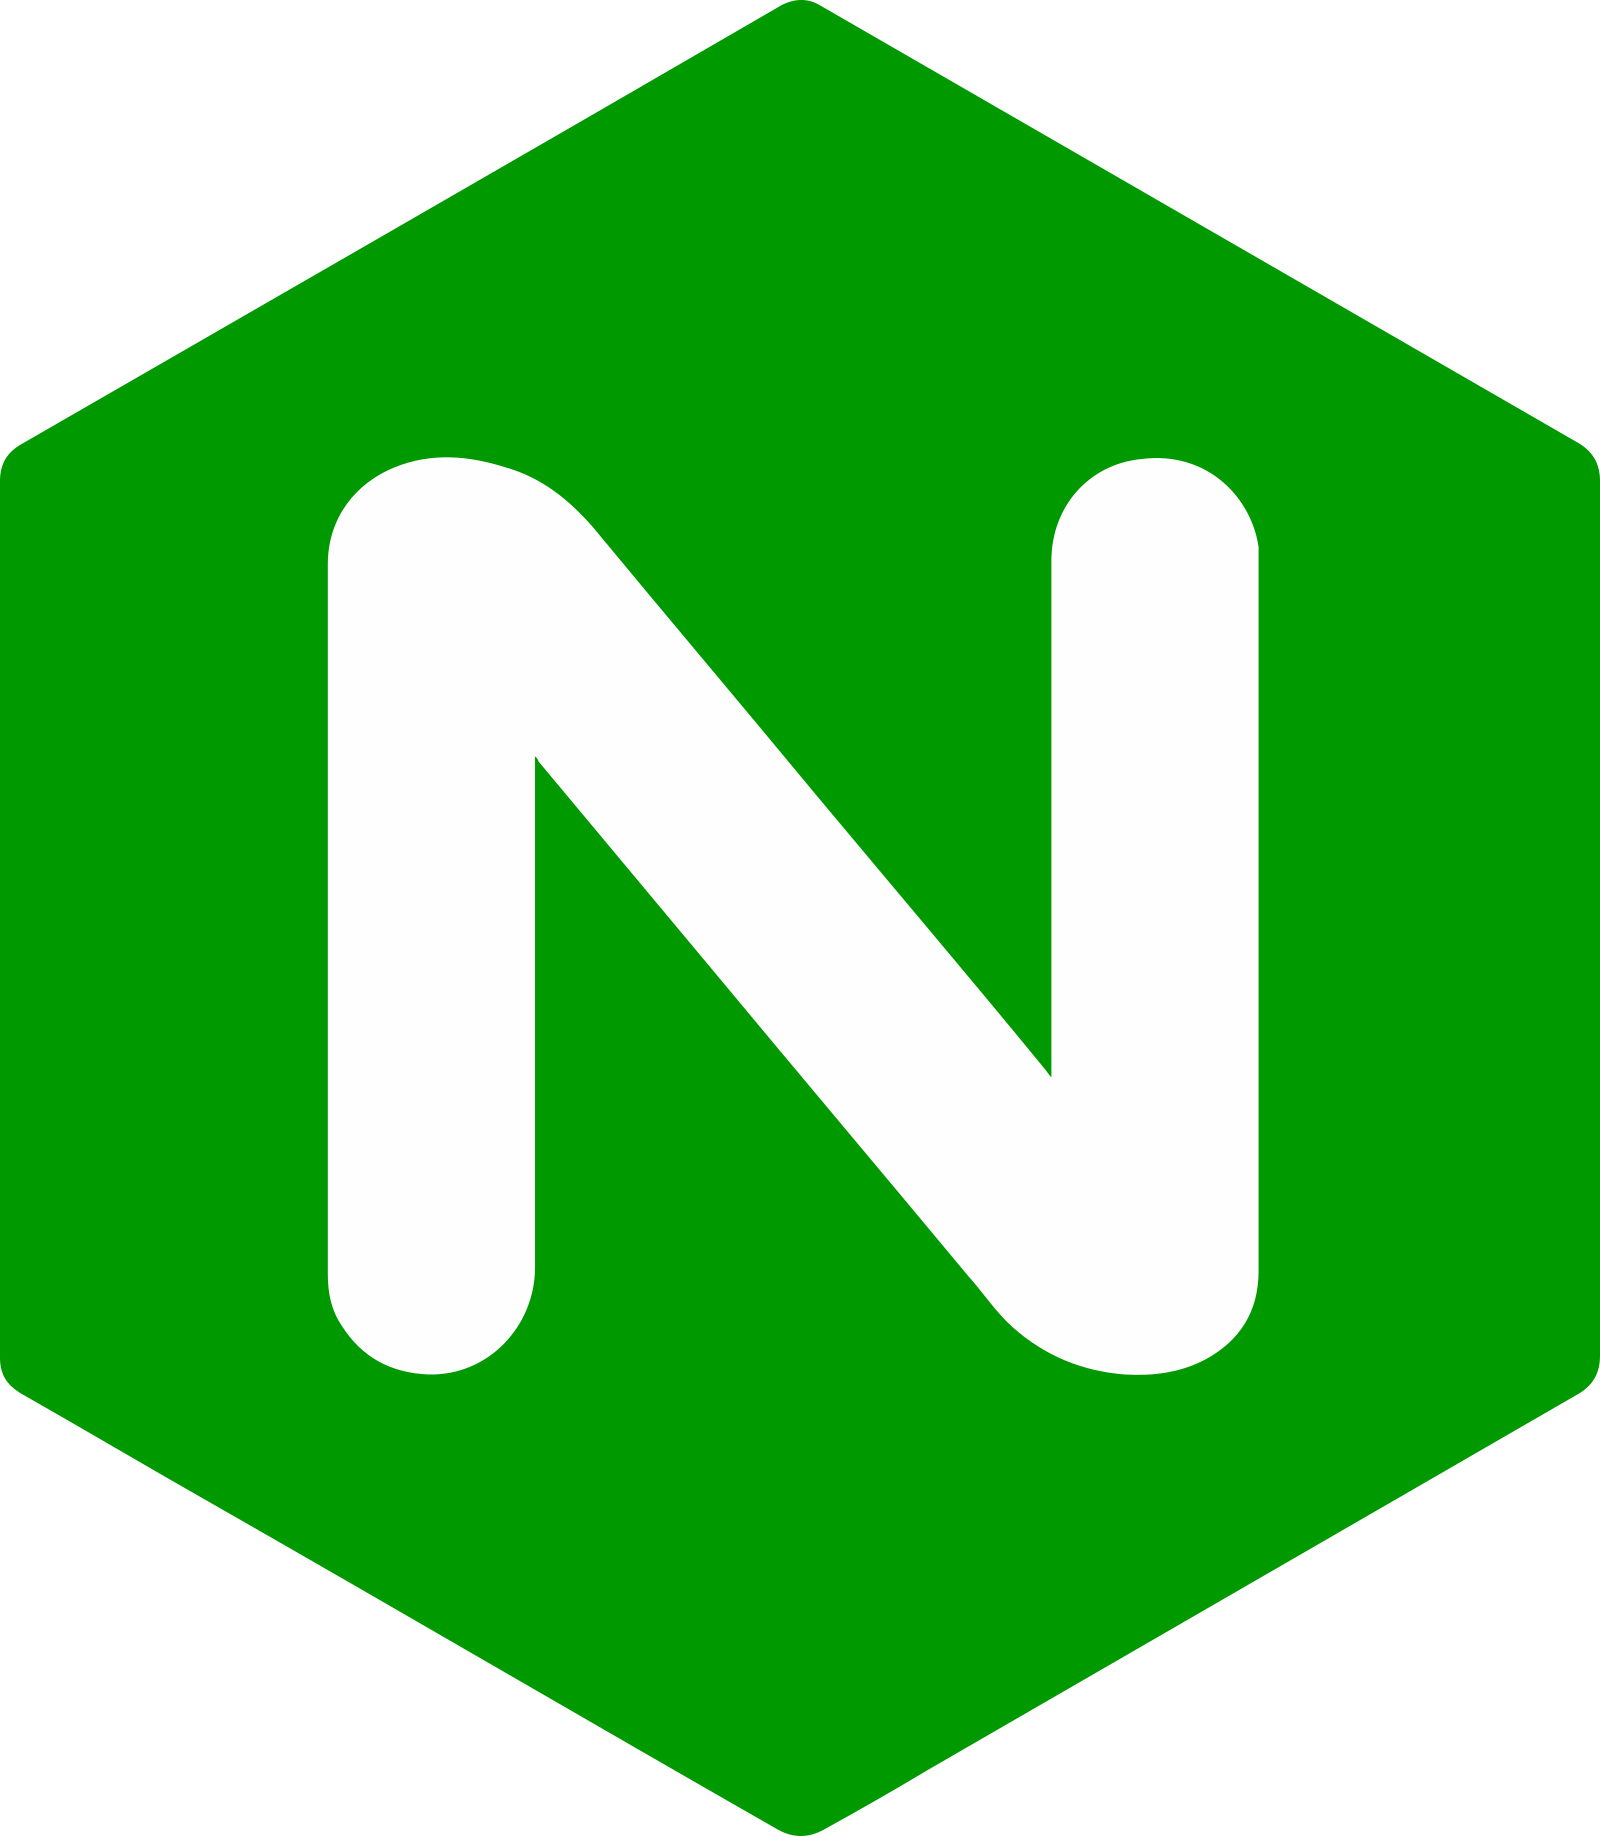 nginx-logo-5